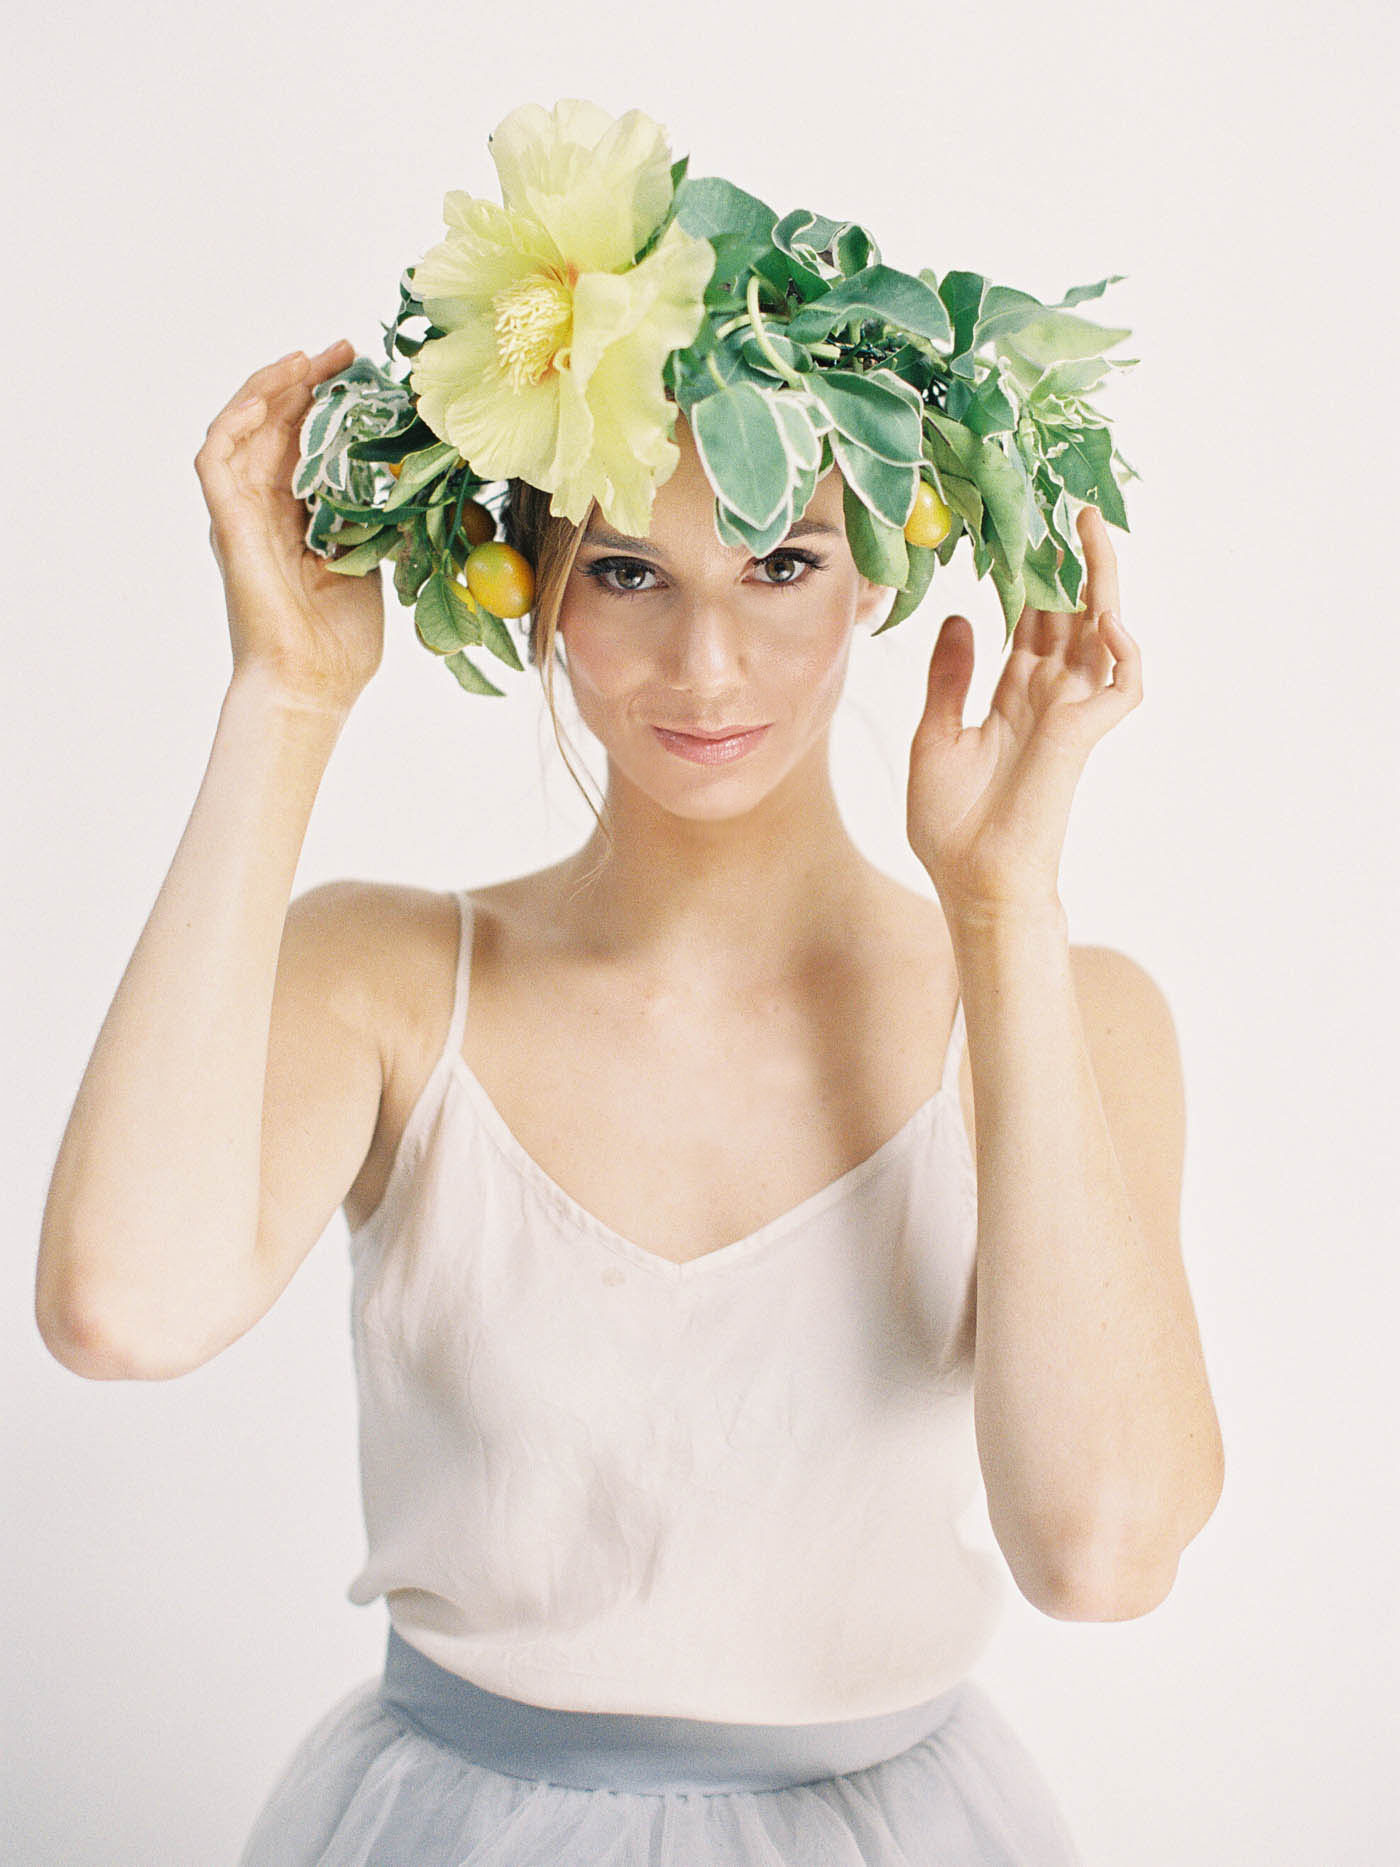 floral-crown-2-Jen_Huang-006837-R1-E020.jpg